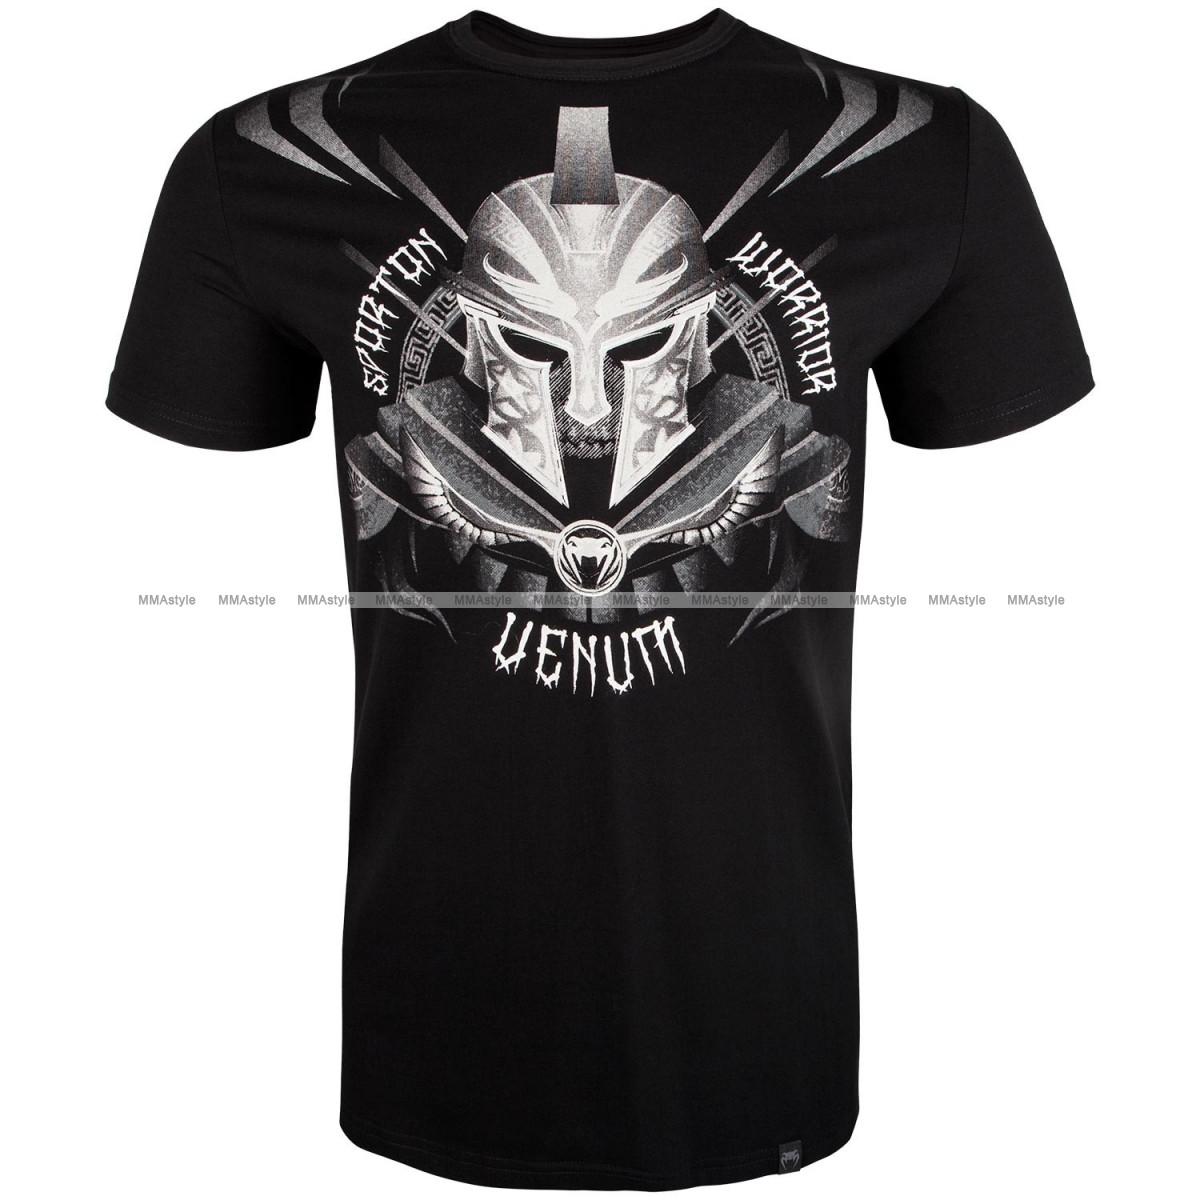 Футболка Venum Gladiator 3.0 T-shirt Black White